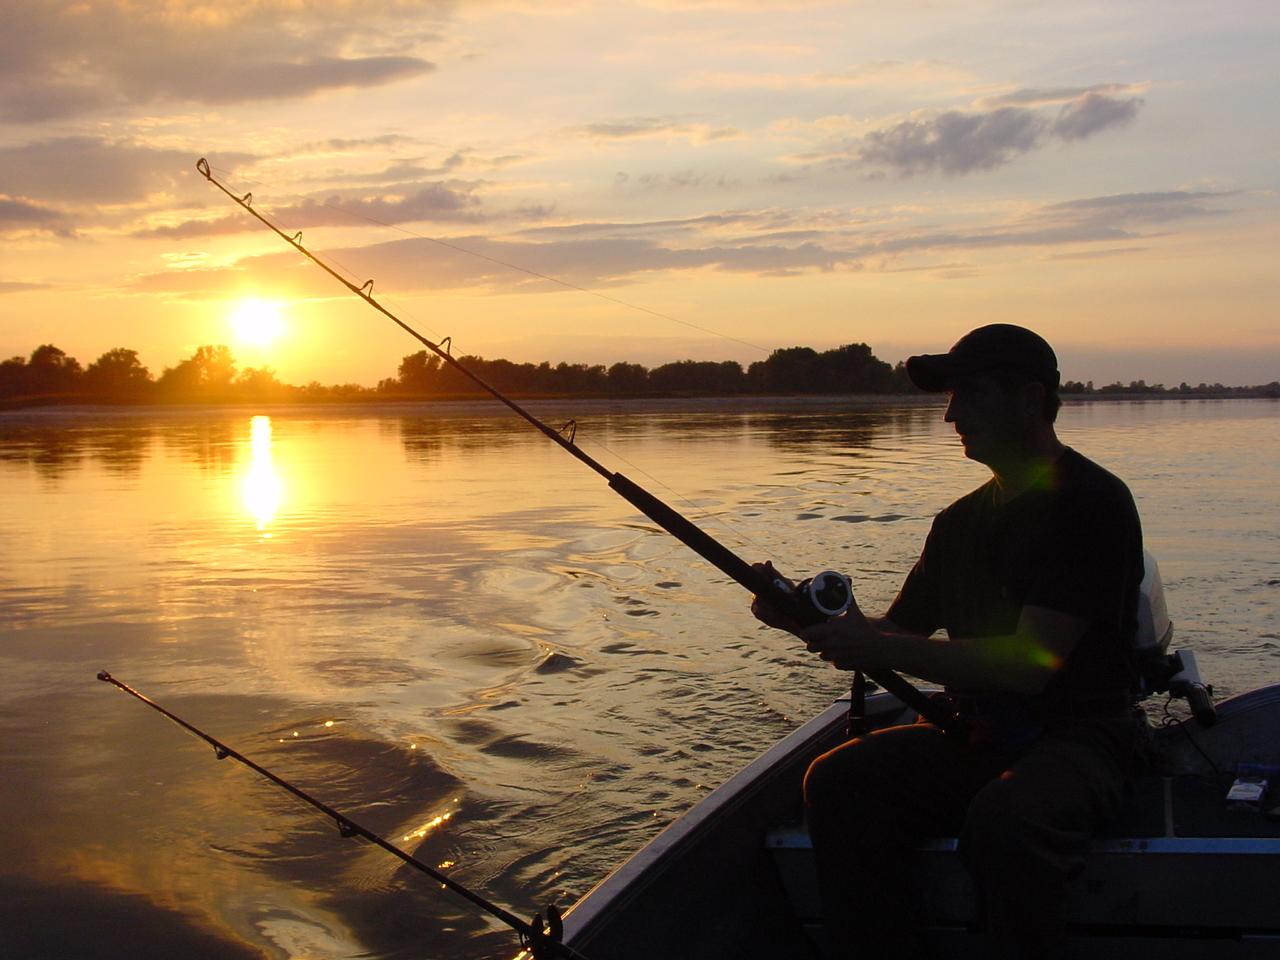 Ribolov na fotkama Fisherman